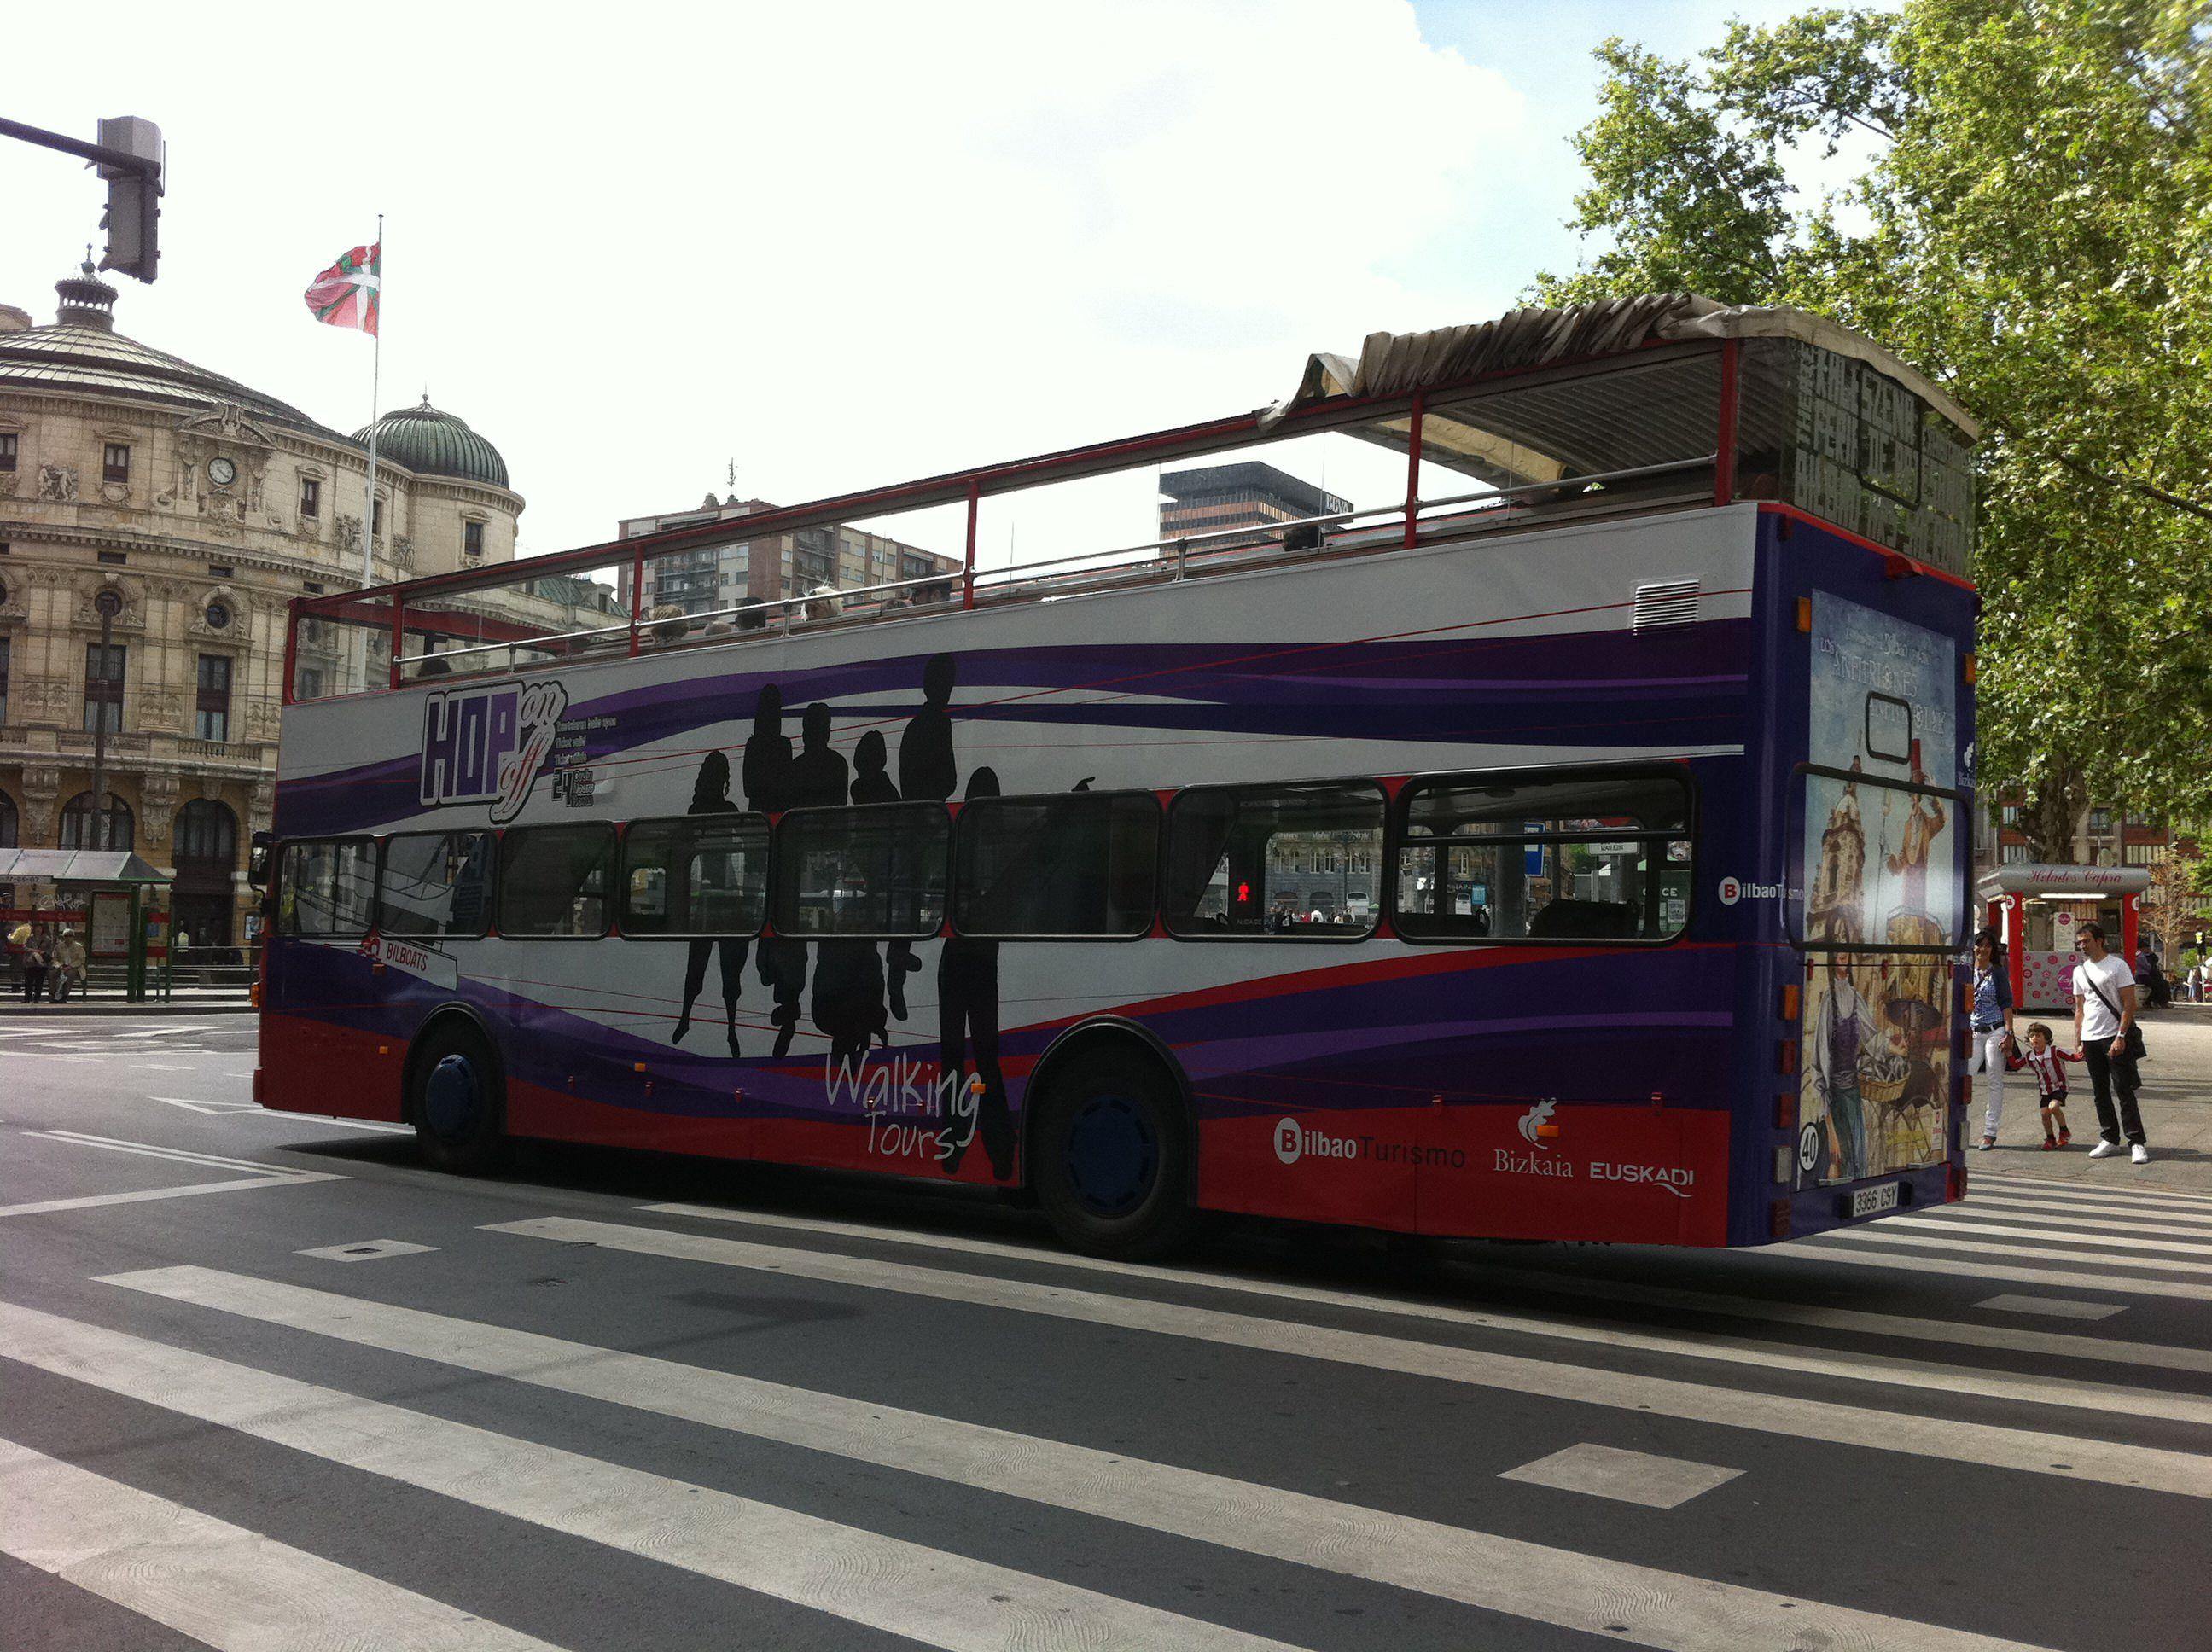 Autobuses de dos pisos en bilbao gu a bilbao turismo - Autobuses de dos pisos ...